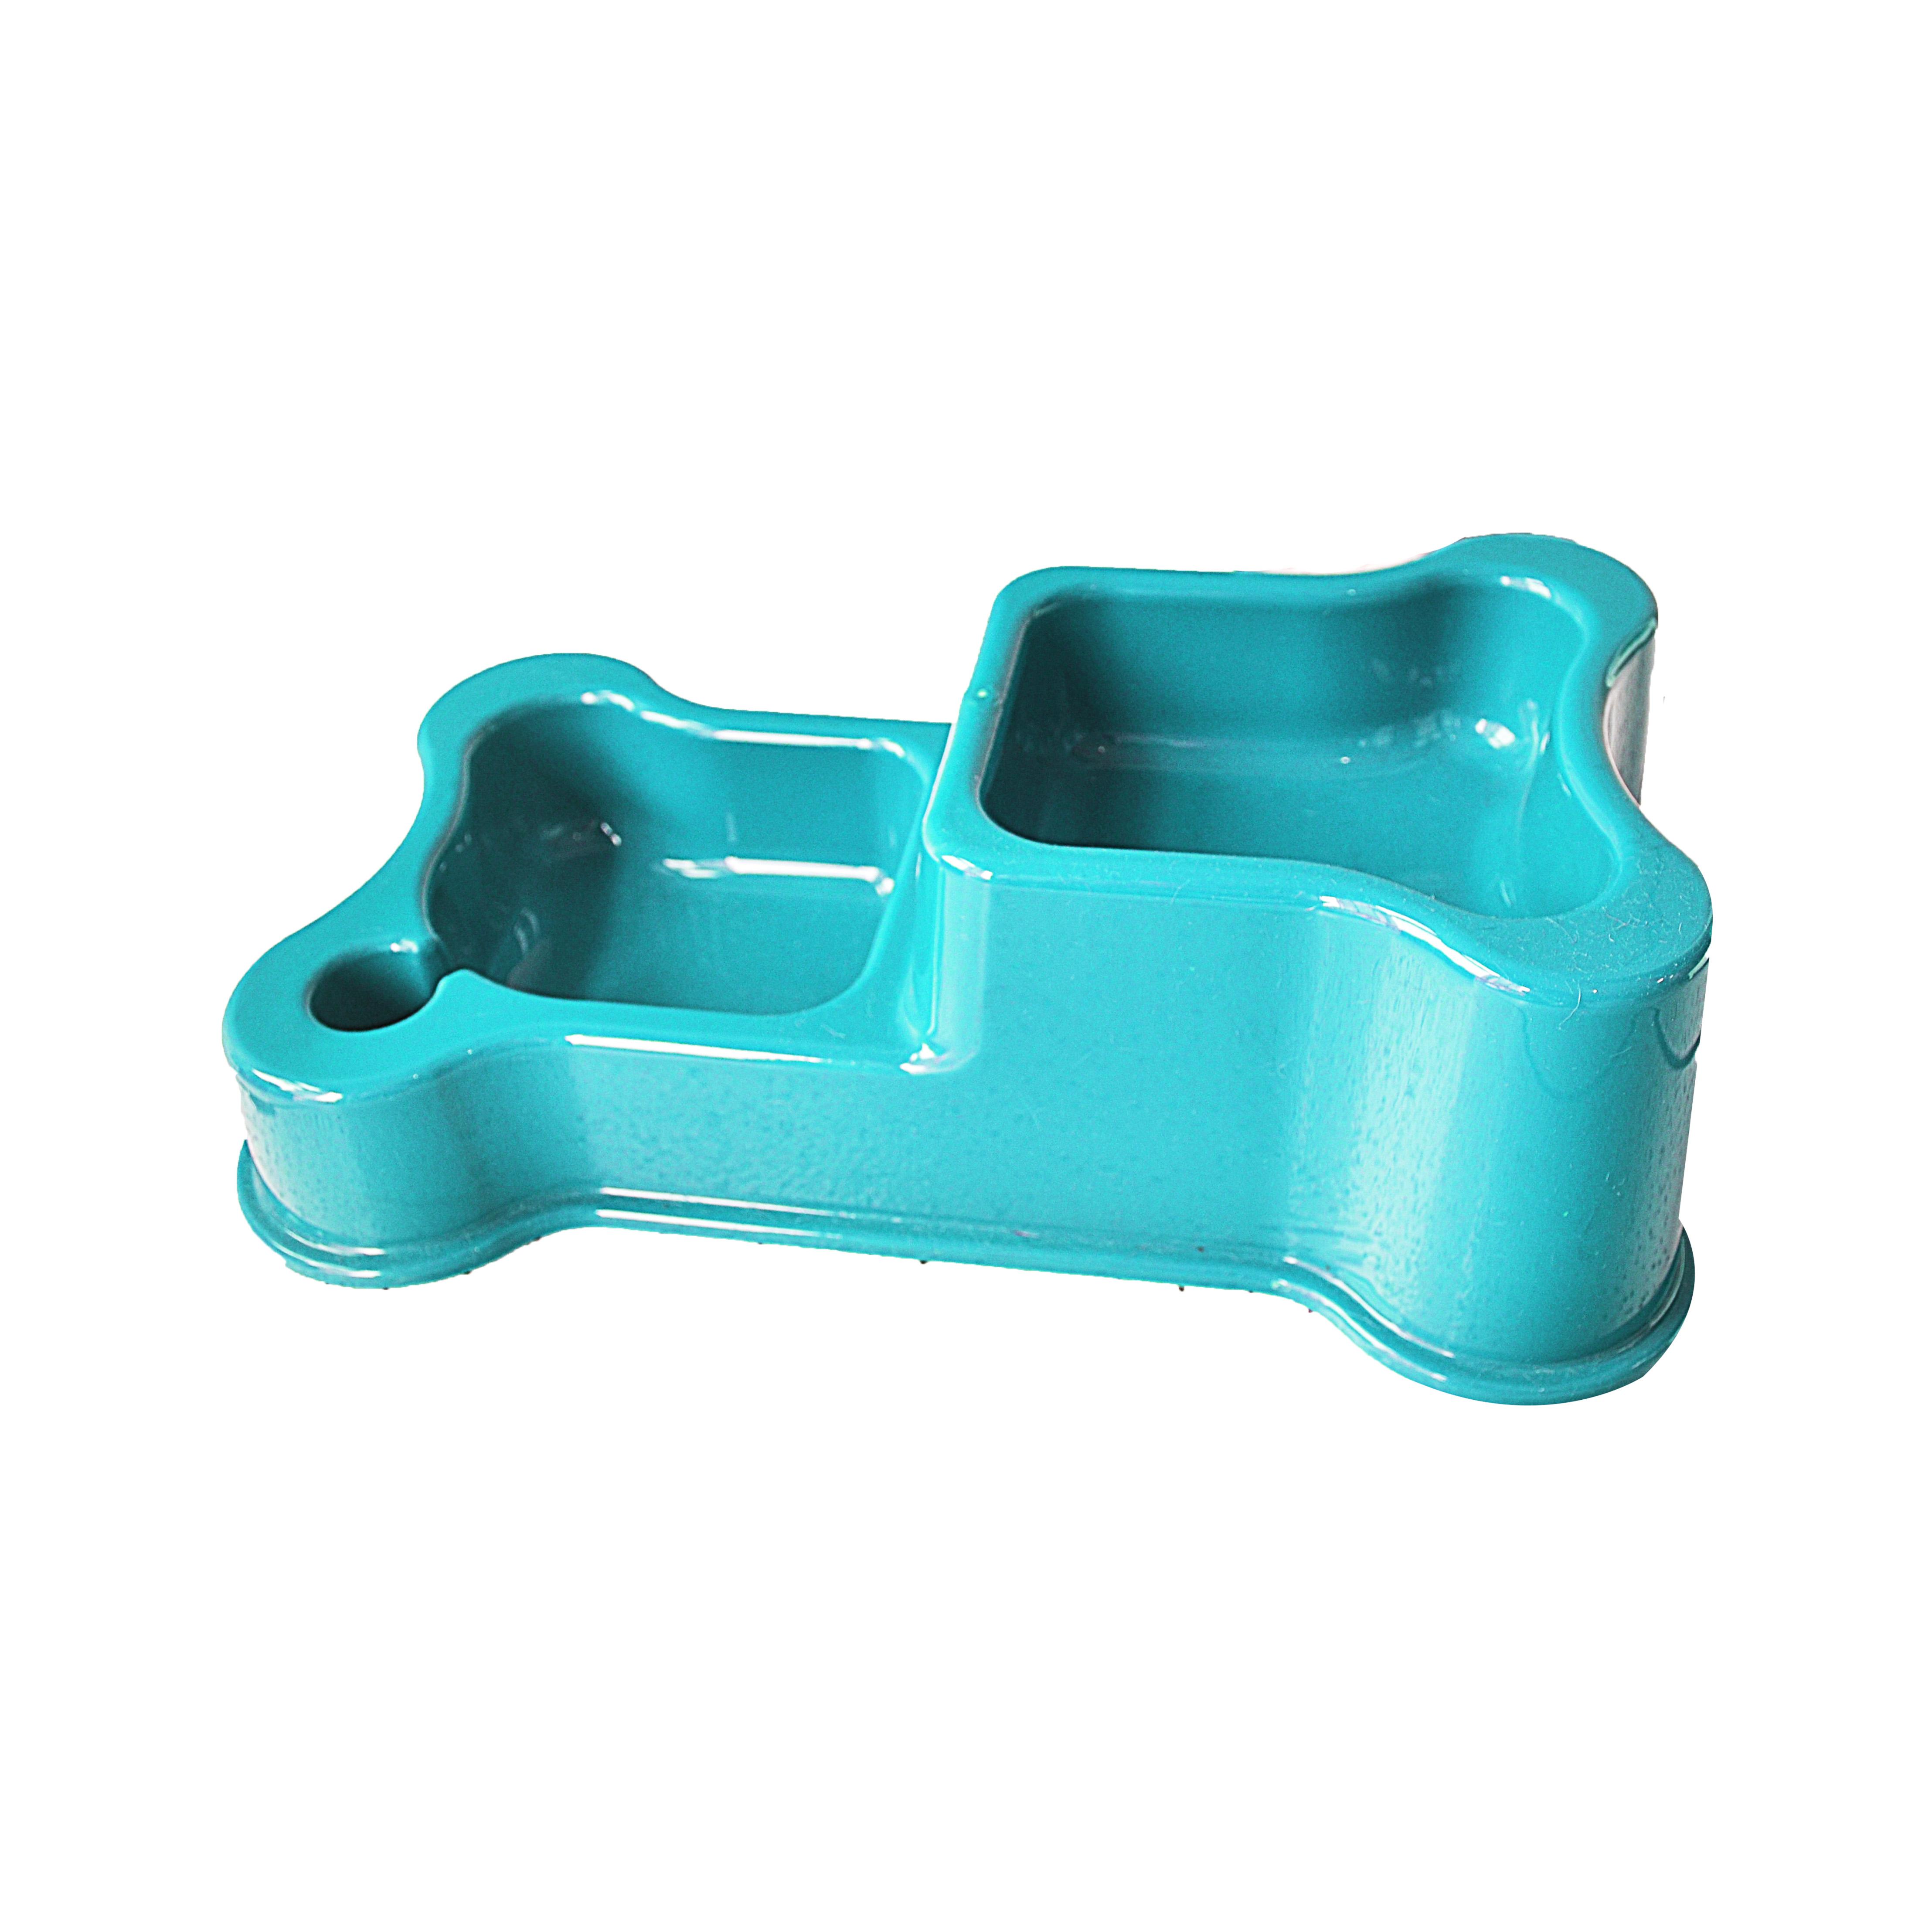 Comedouro e bebedouro duplo style ocean blue anti-formiga